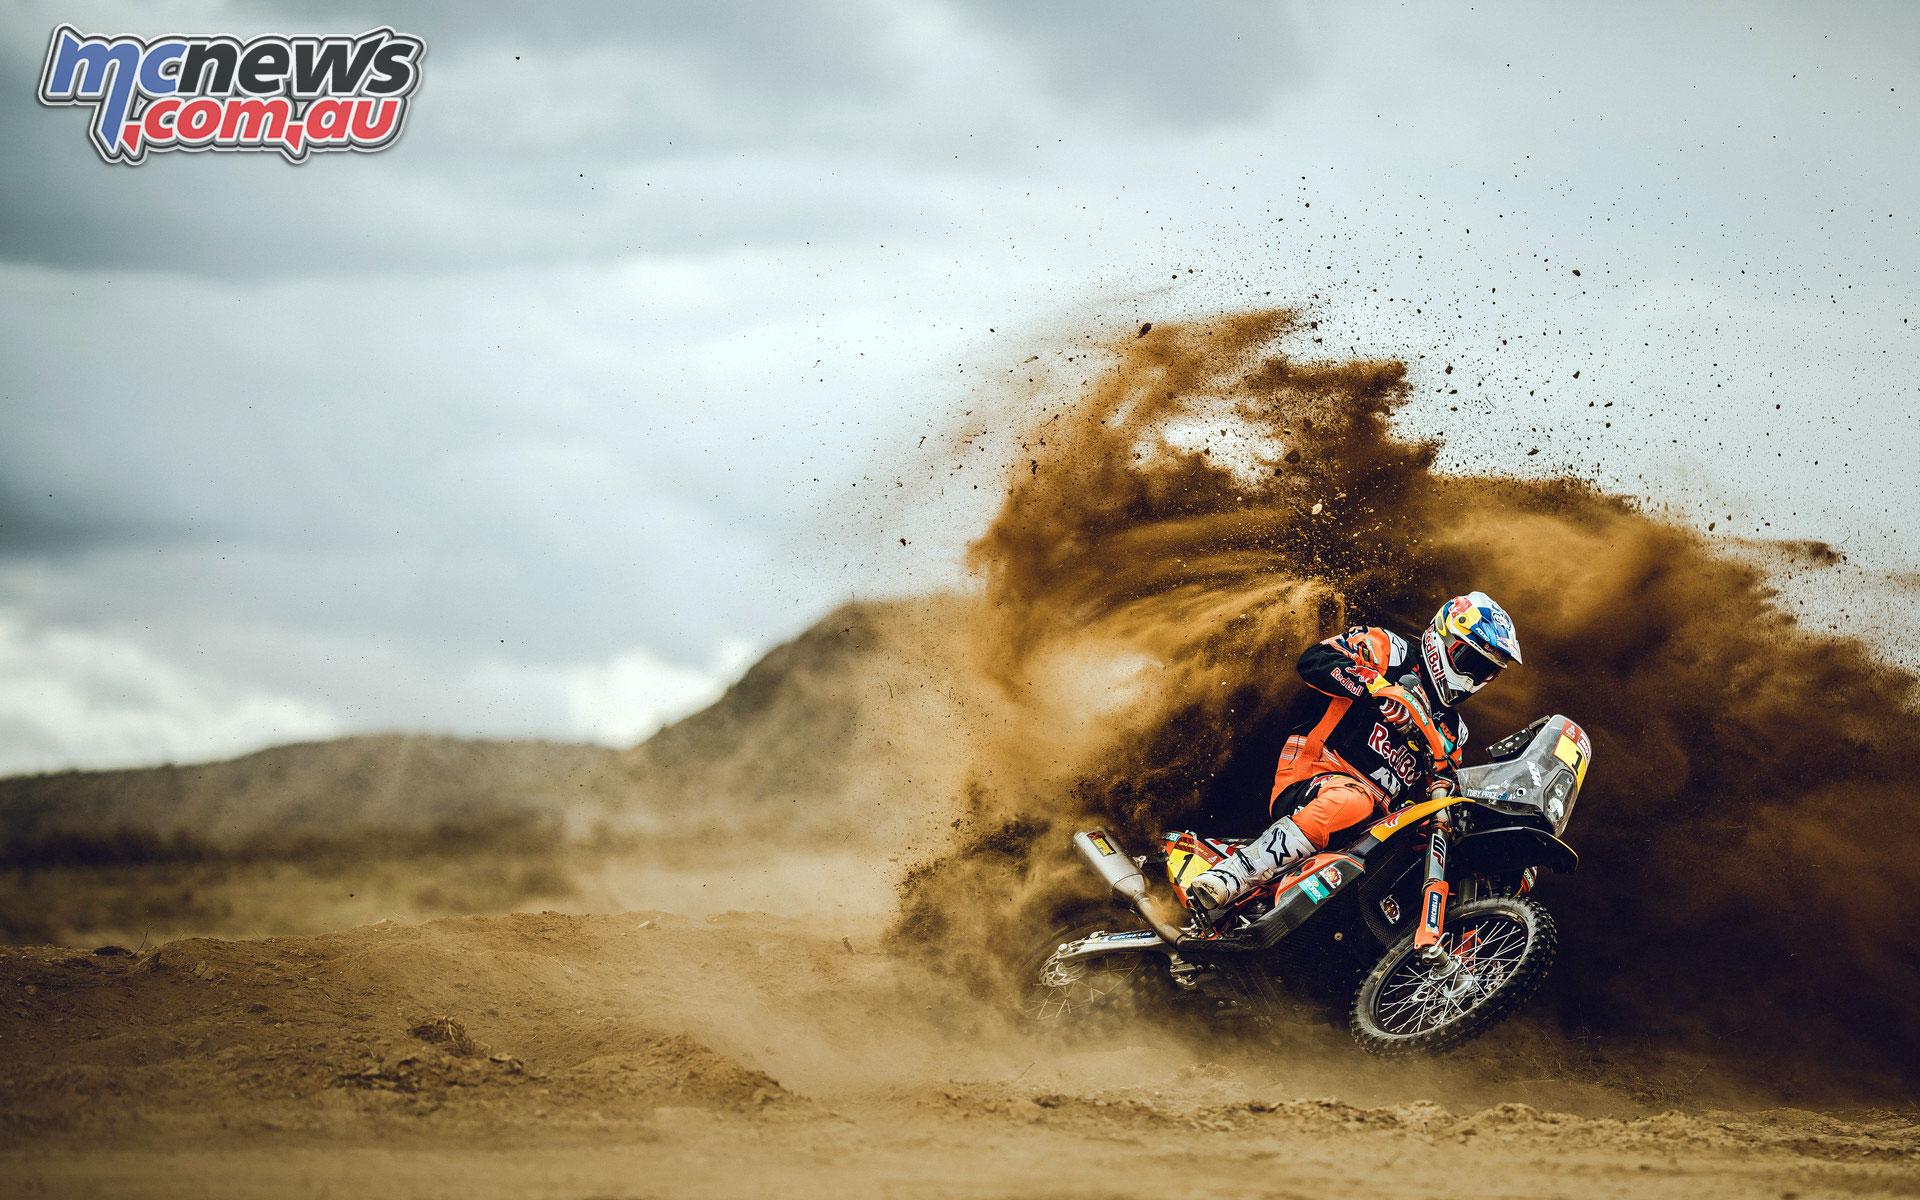 Toby Price KTM DAKAR RALLY STAGE